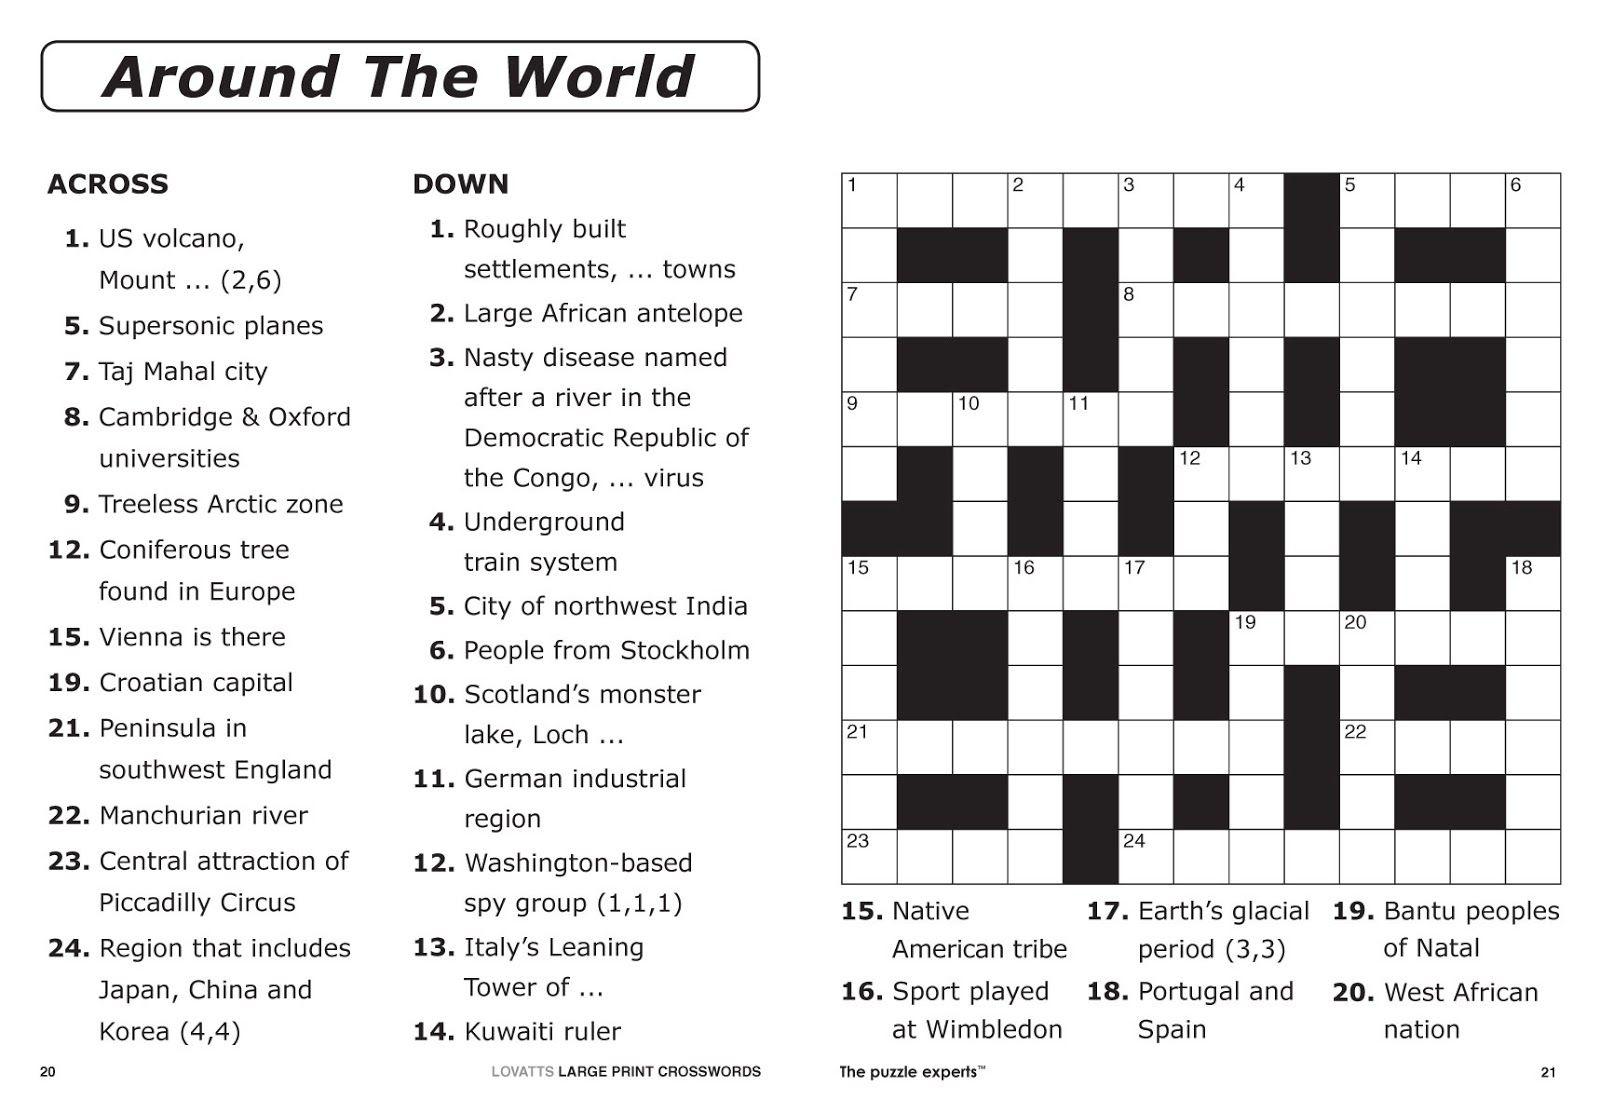 Free Printable Large Print Crossword Puzzles | M3U8 - Printable Crossword Puzzles For Beginners